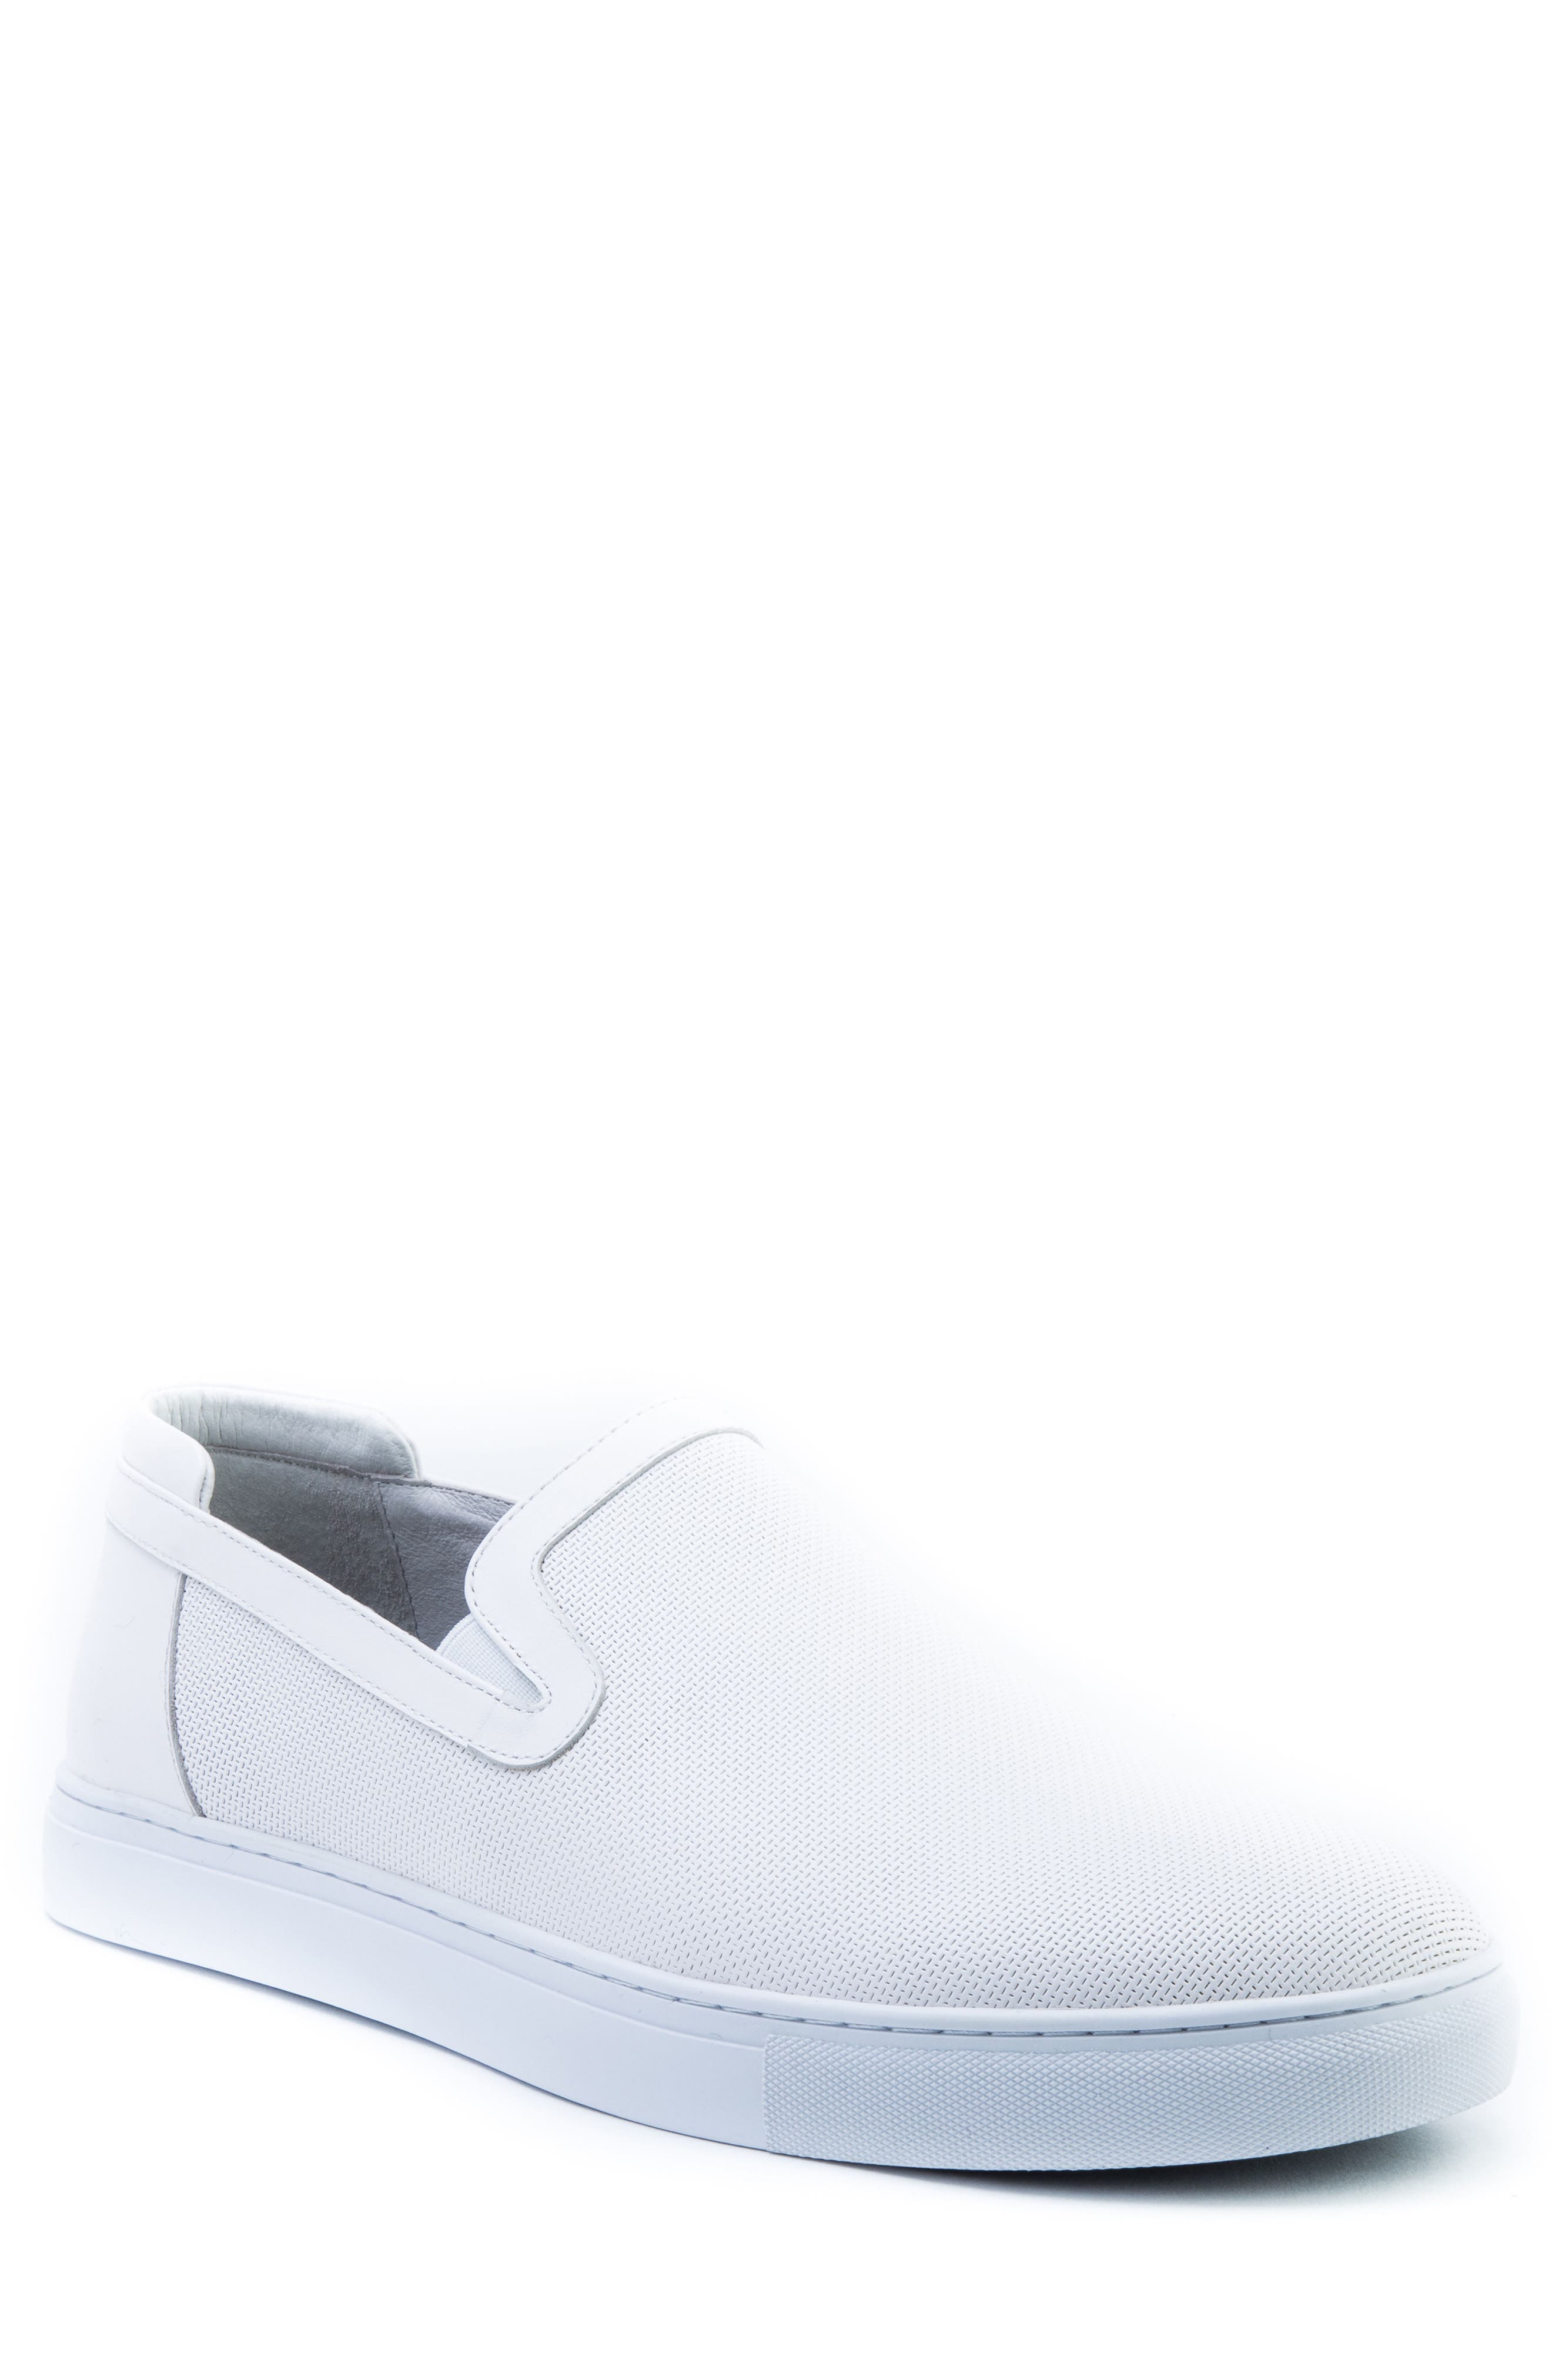 Grant Sneaker,                         Main,                         color, White Leather